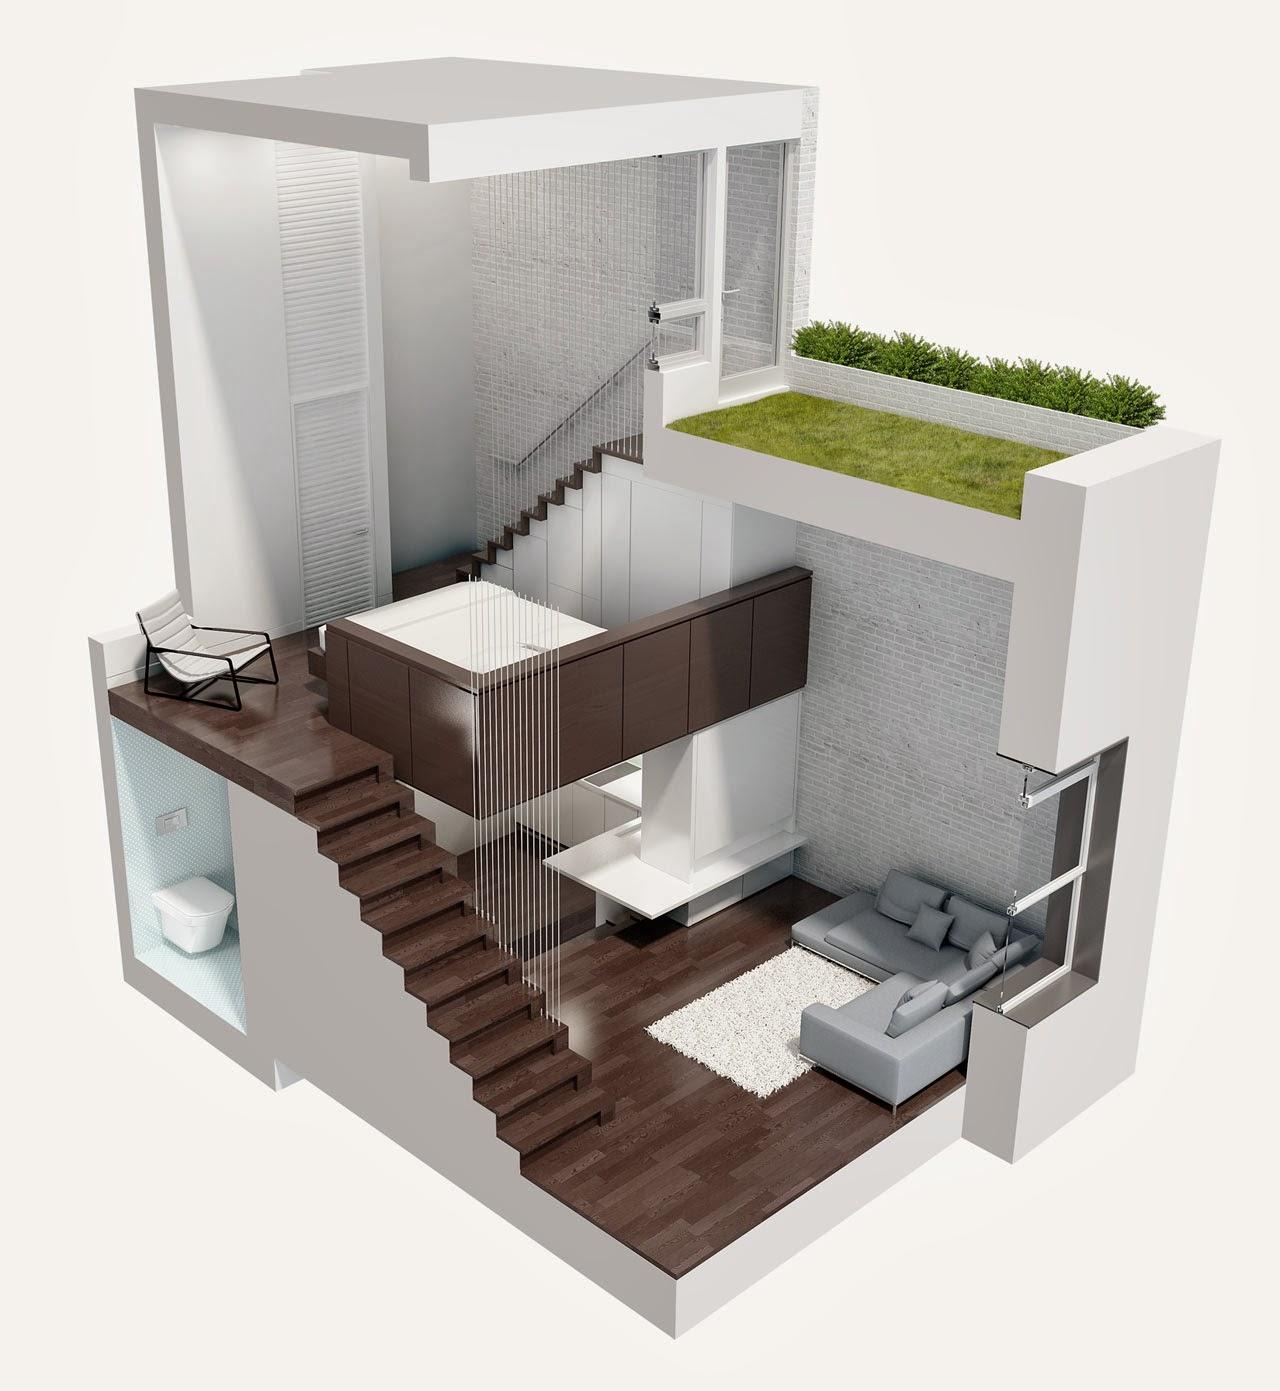 Ruang Tamu Dapur Bilik Mandi Tidur Dan Juga Balkoni Rekaan Perabut Sangat Minimalis Yg Membuatkan Kecil Ini Nampak Luas